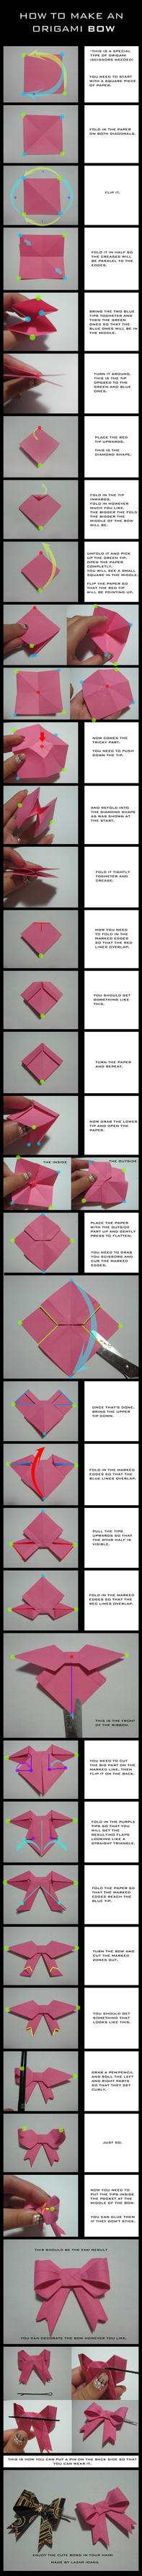 TUTORIAL: Origami Bow by DarkUmah